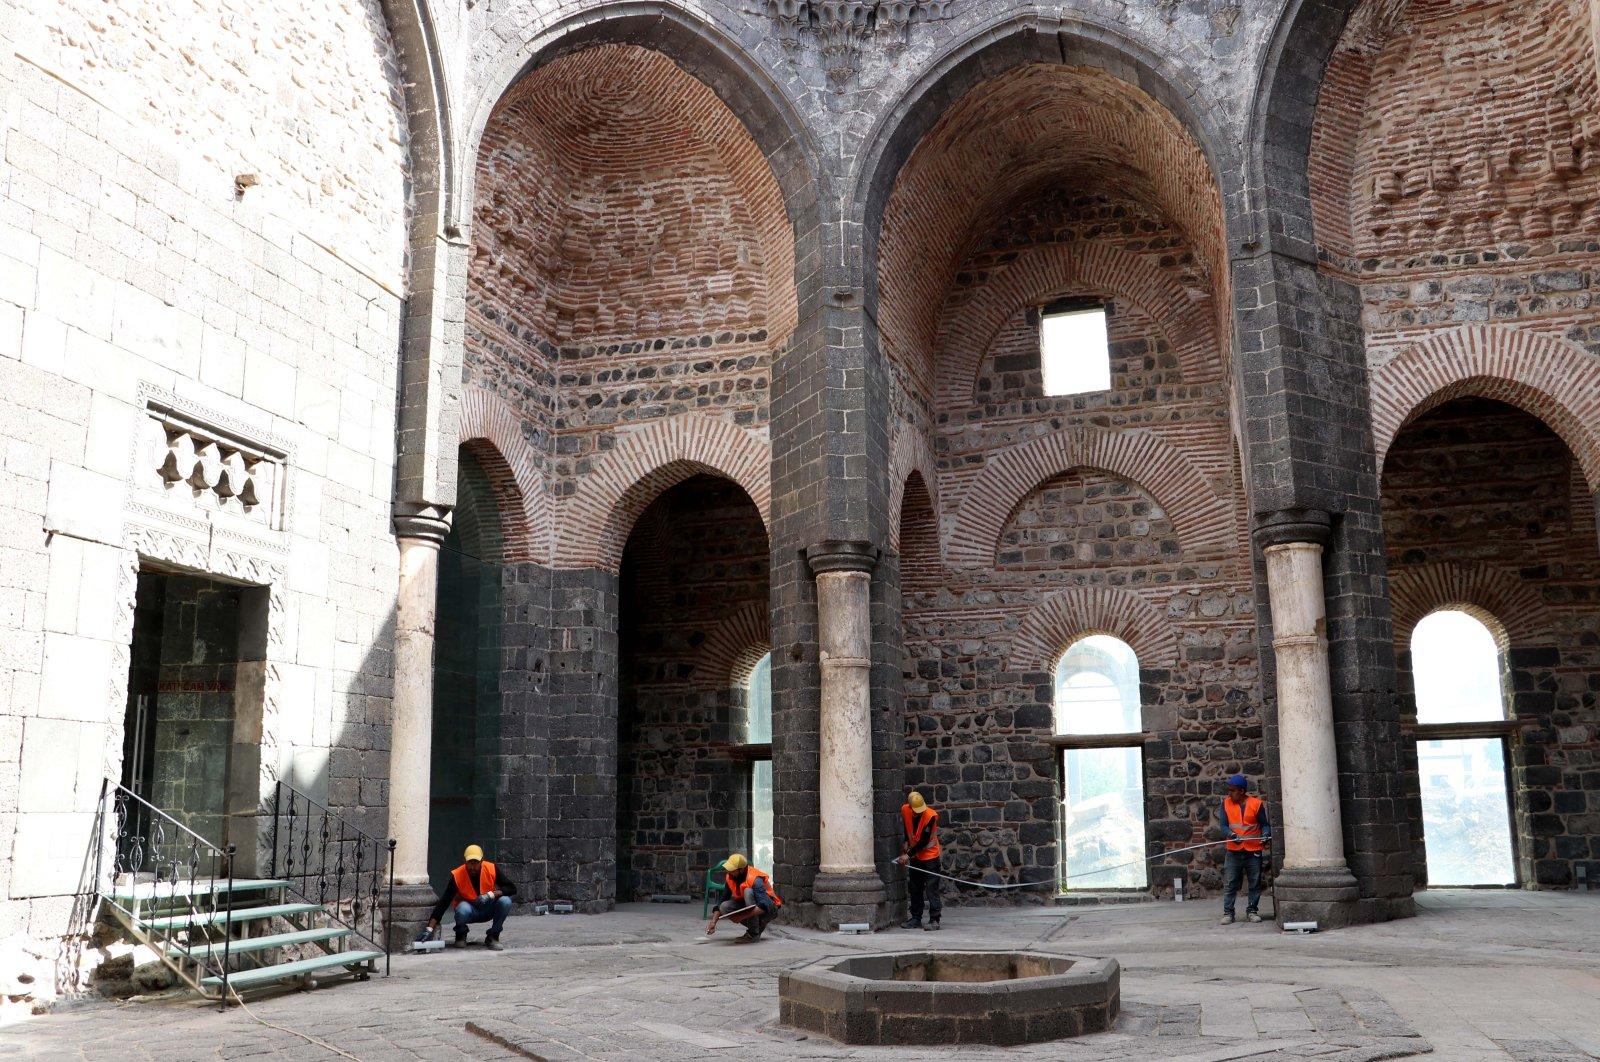 Roman-era church to regain former glory in Turkey's Diyarbakır